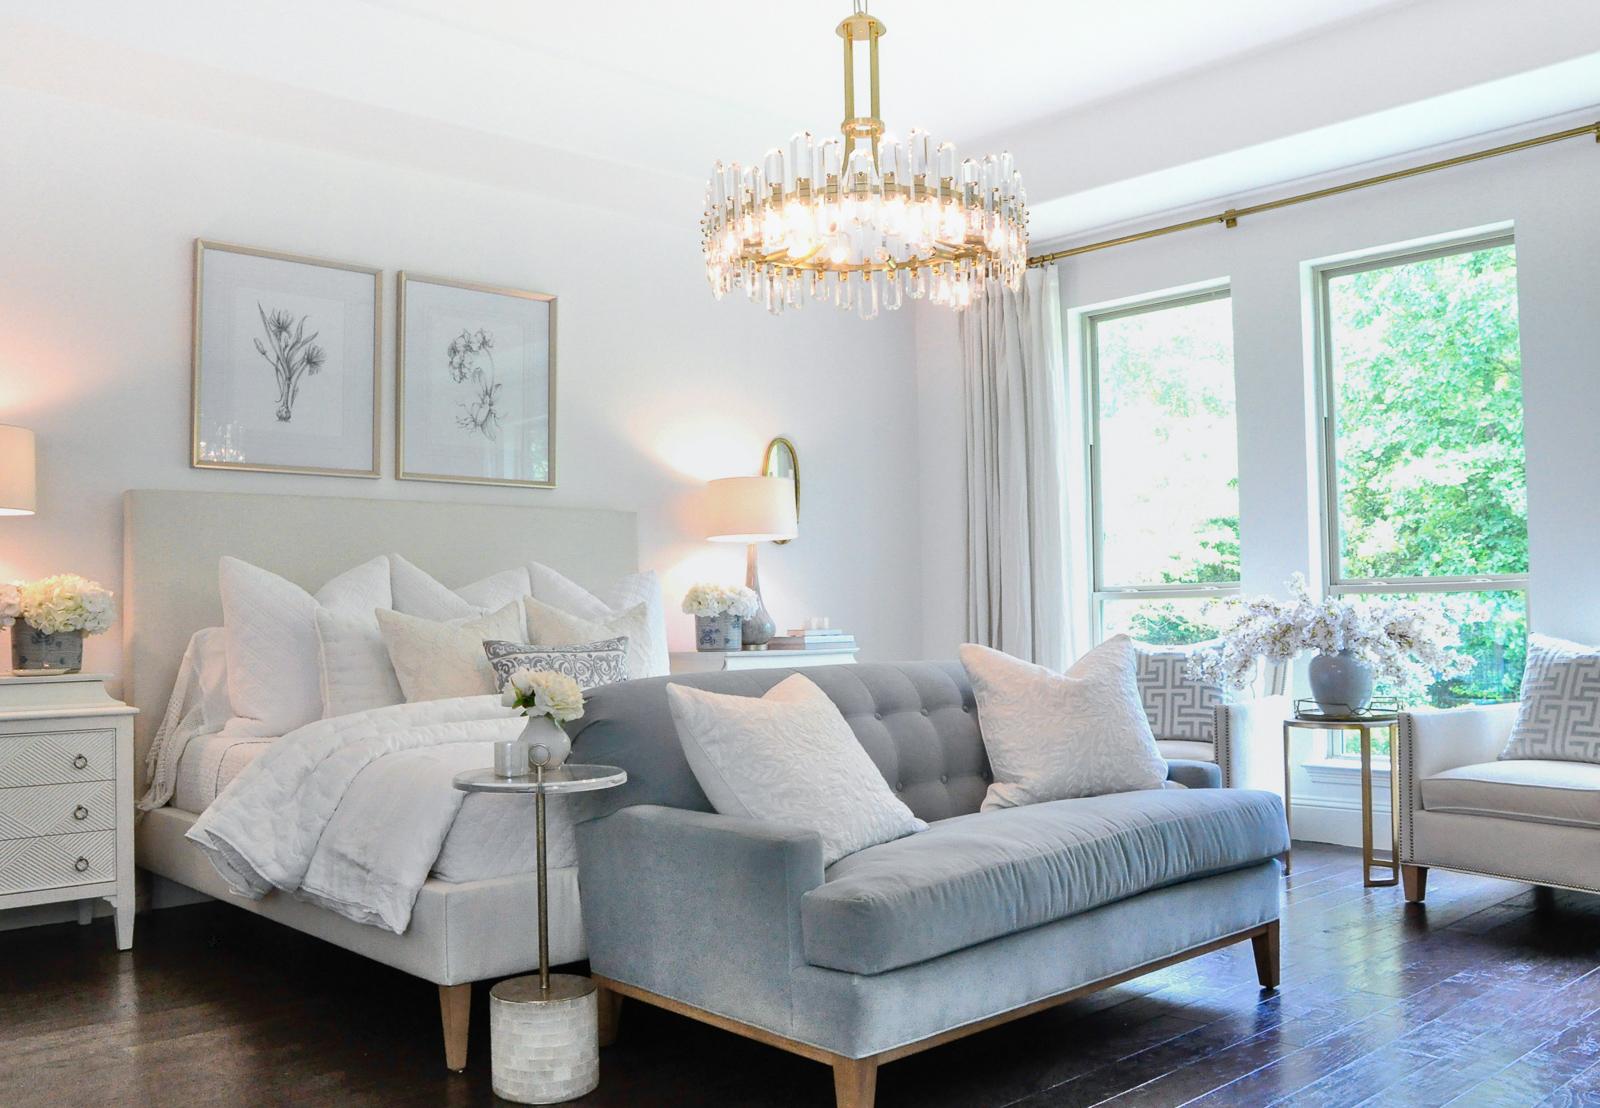 Bedding Decor Gold Designs